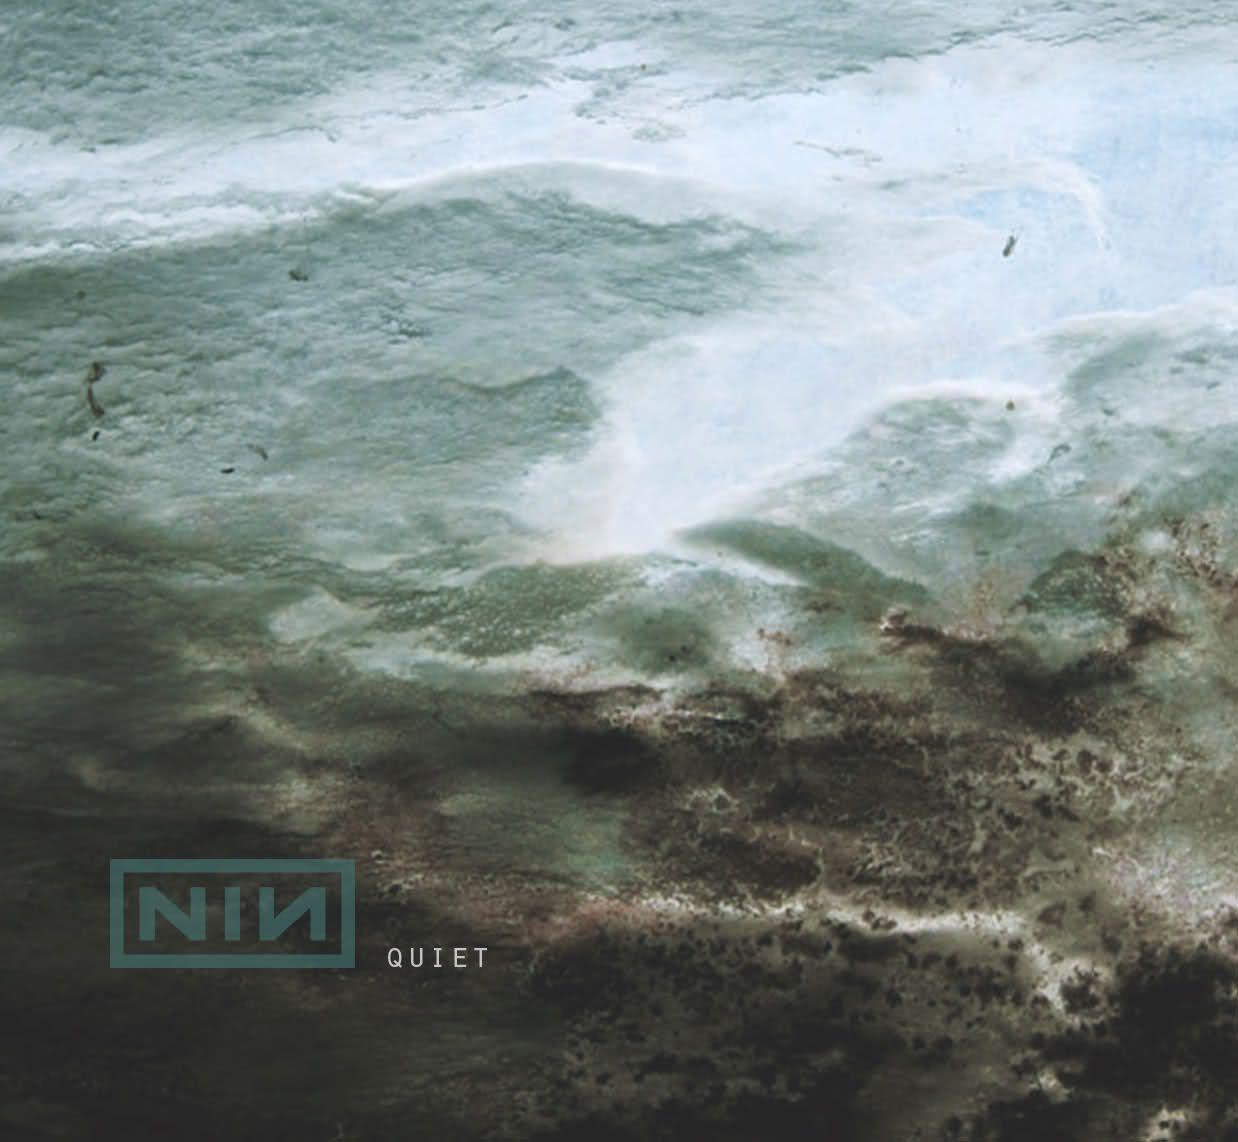 Nine Inch Nails - Quiet | Nine Inch Nails | Pinterest | Trent reznor